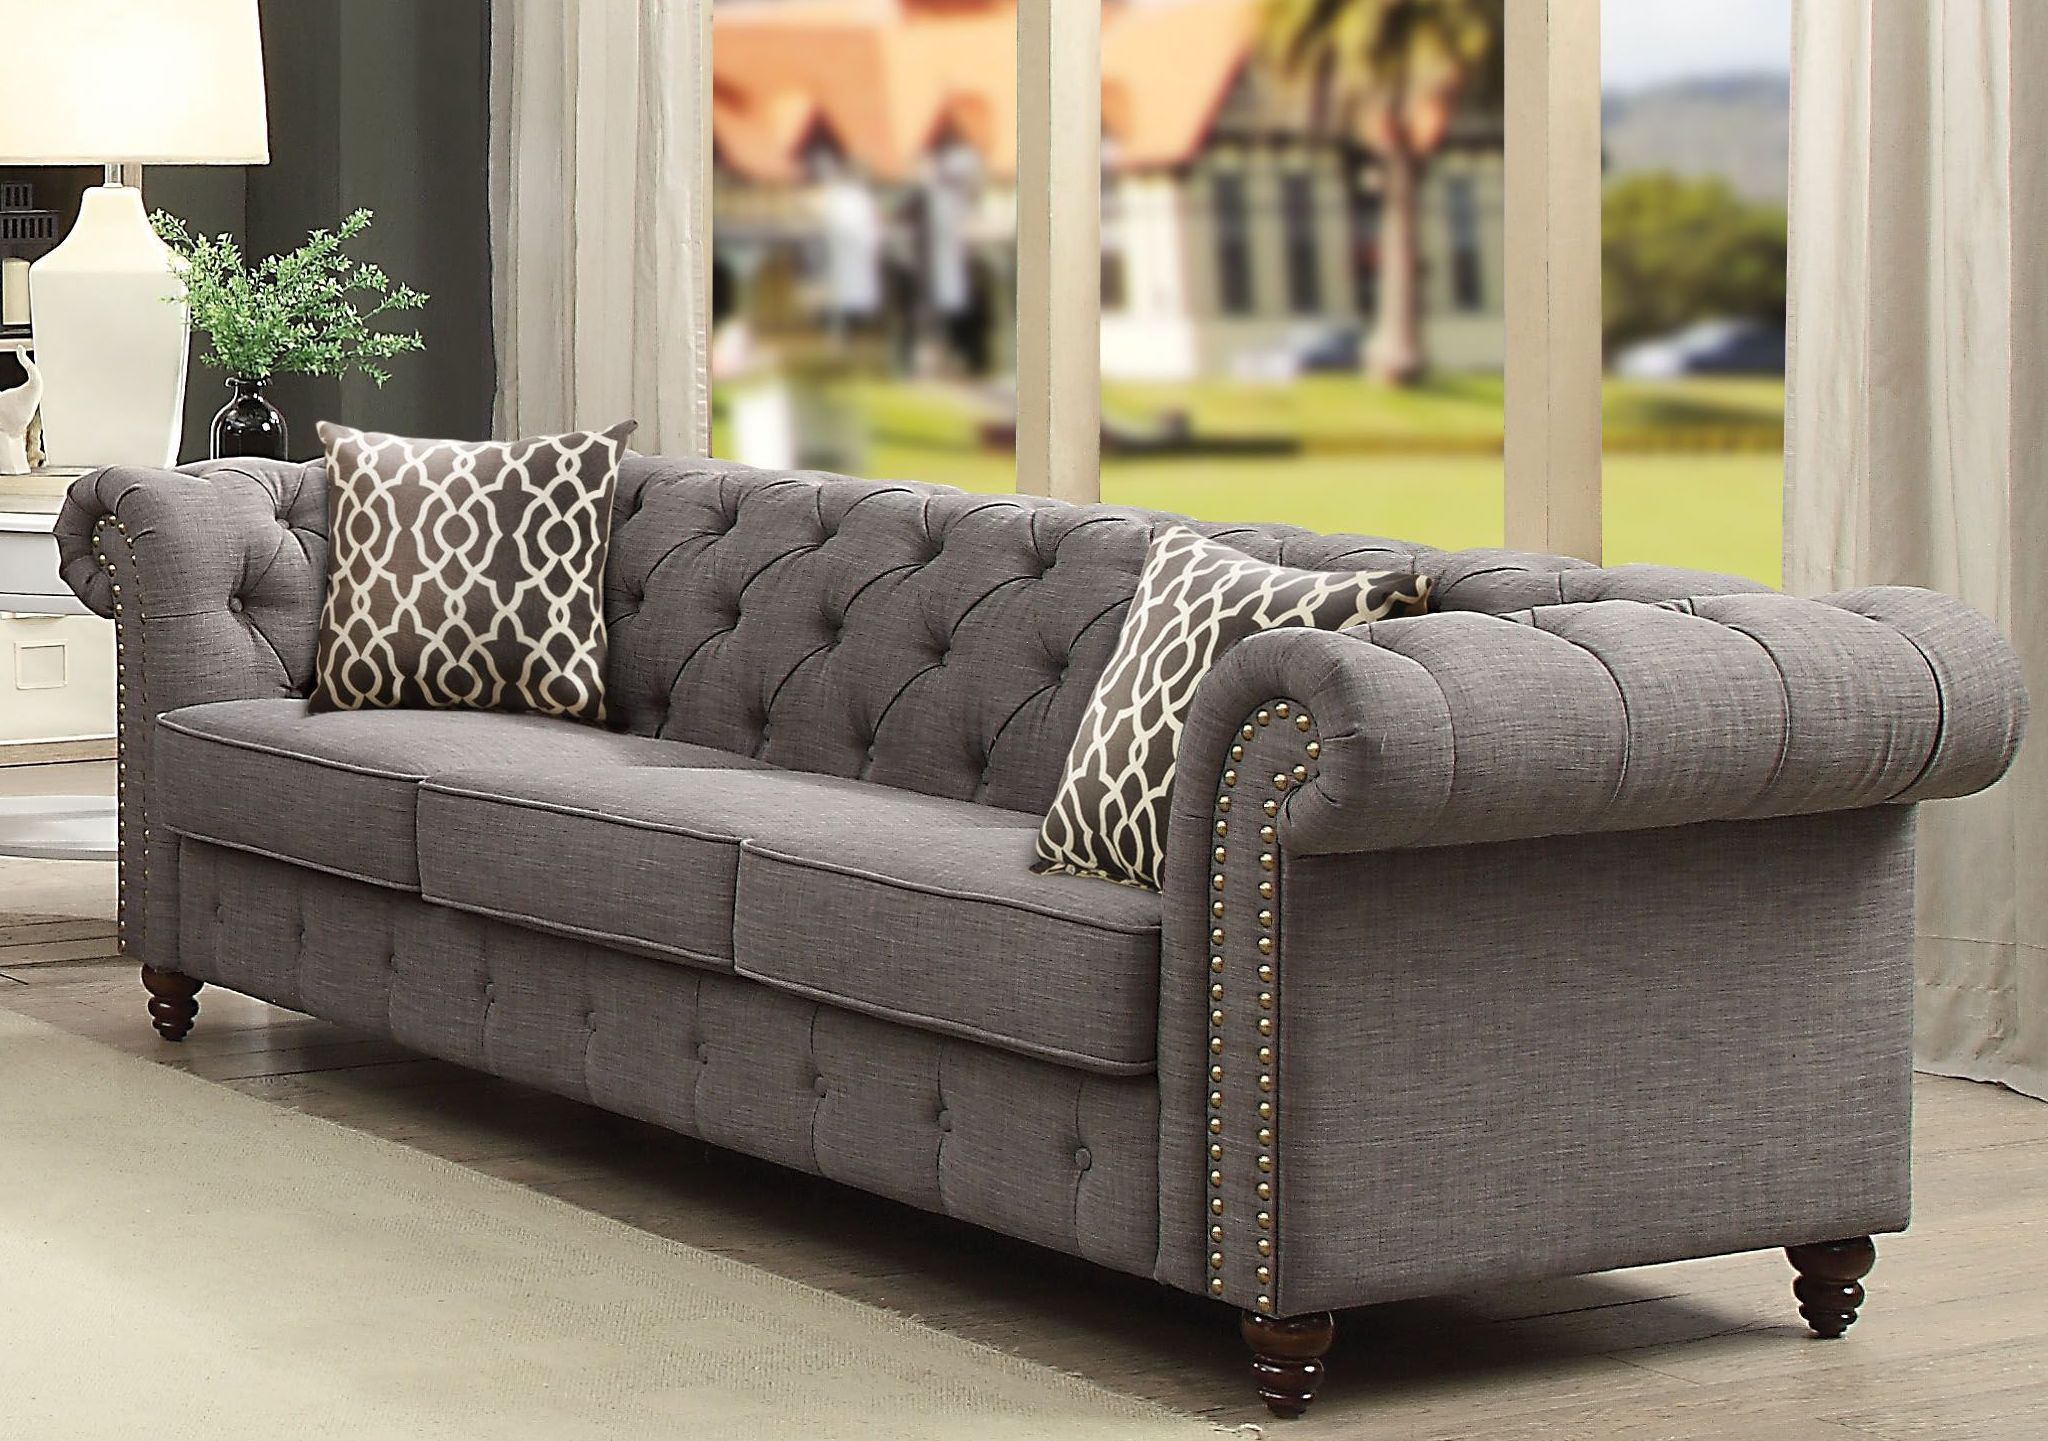 Aurelia Gray Linen Sofa from Acme